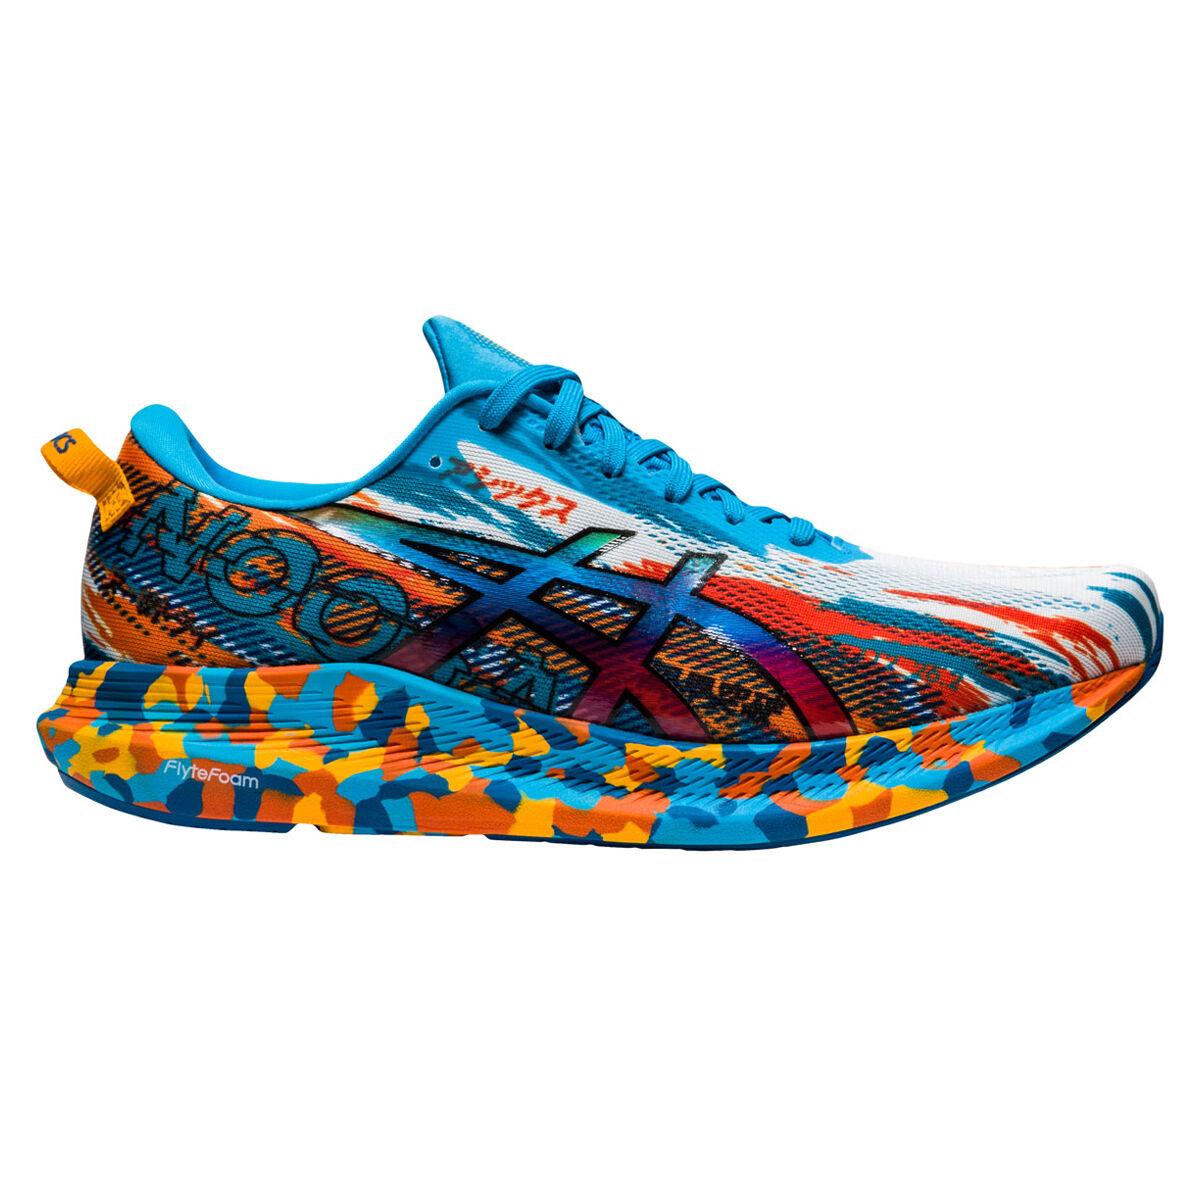 Asics GEL Noosa Tri 13 Mens Running Shoes | 7south Sport